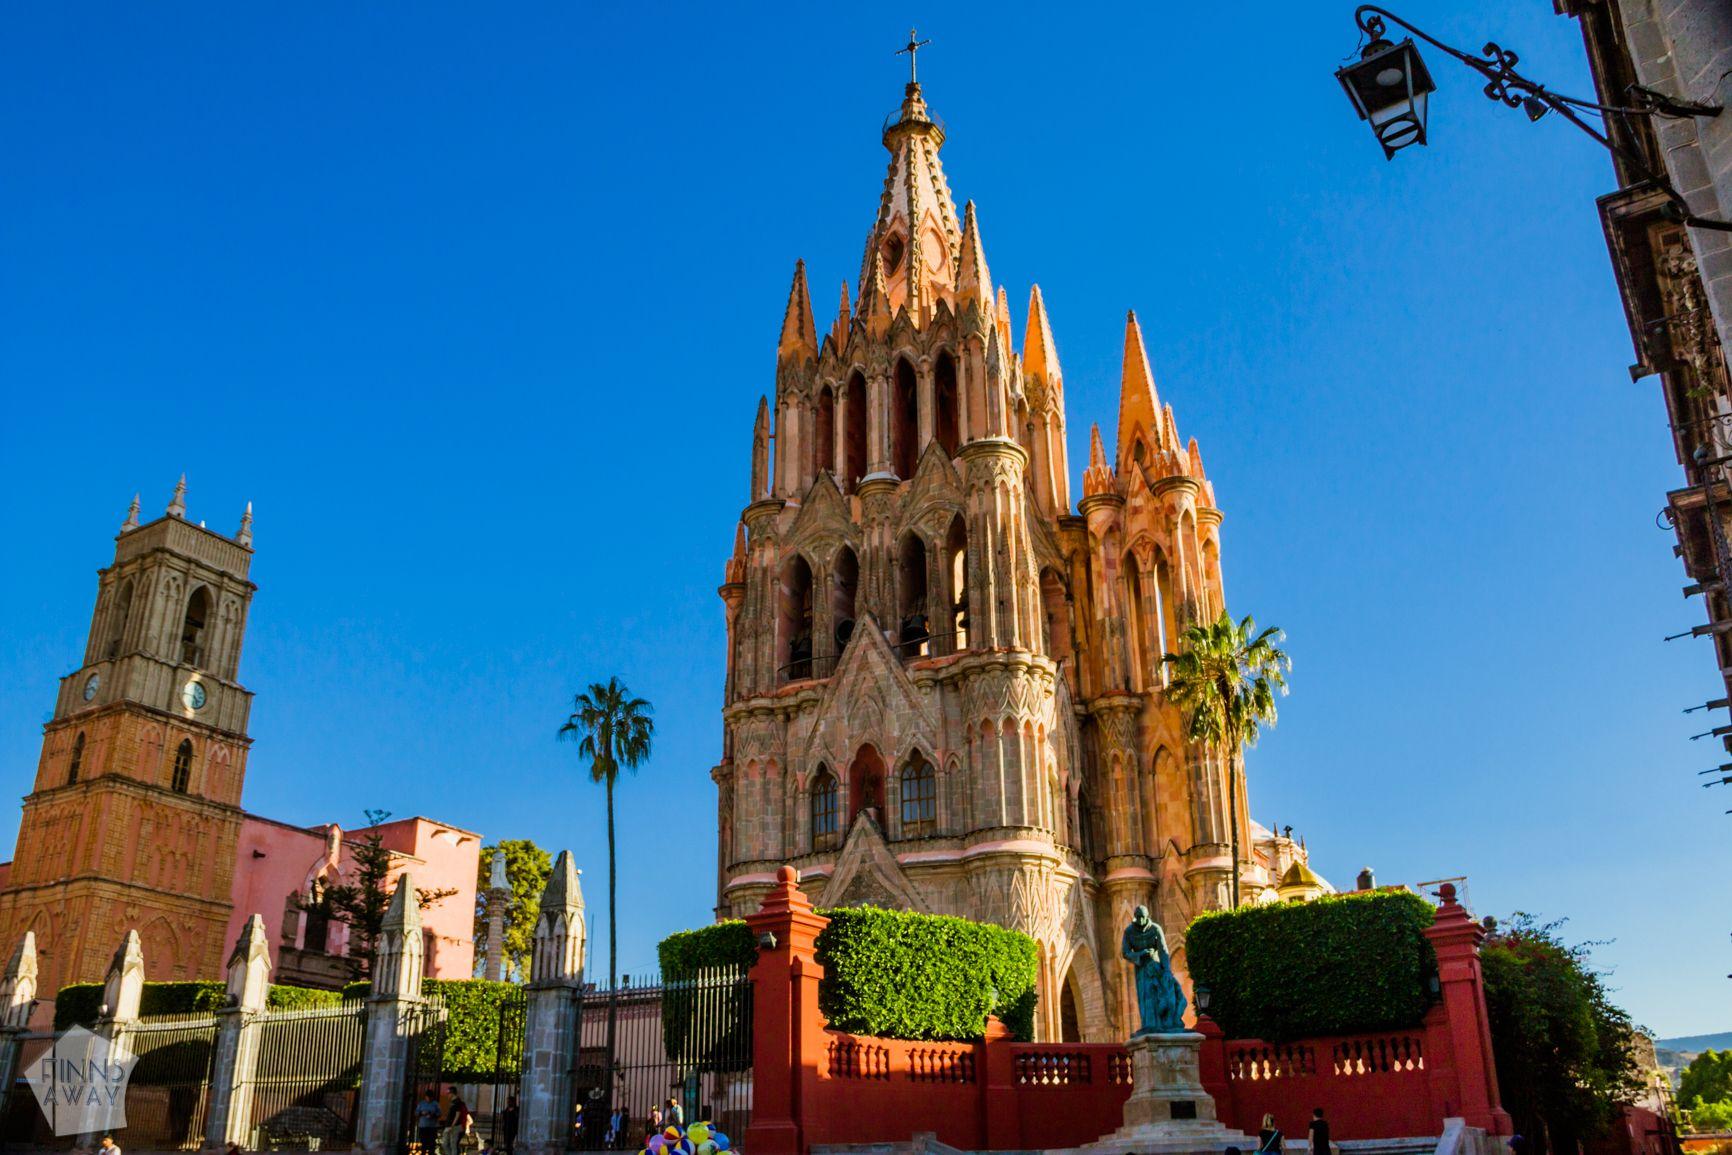 Church of Saint Michael the Archangel, San Miguel de Allende | FinnsAway Travel Blog